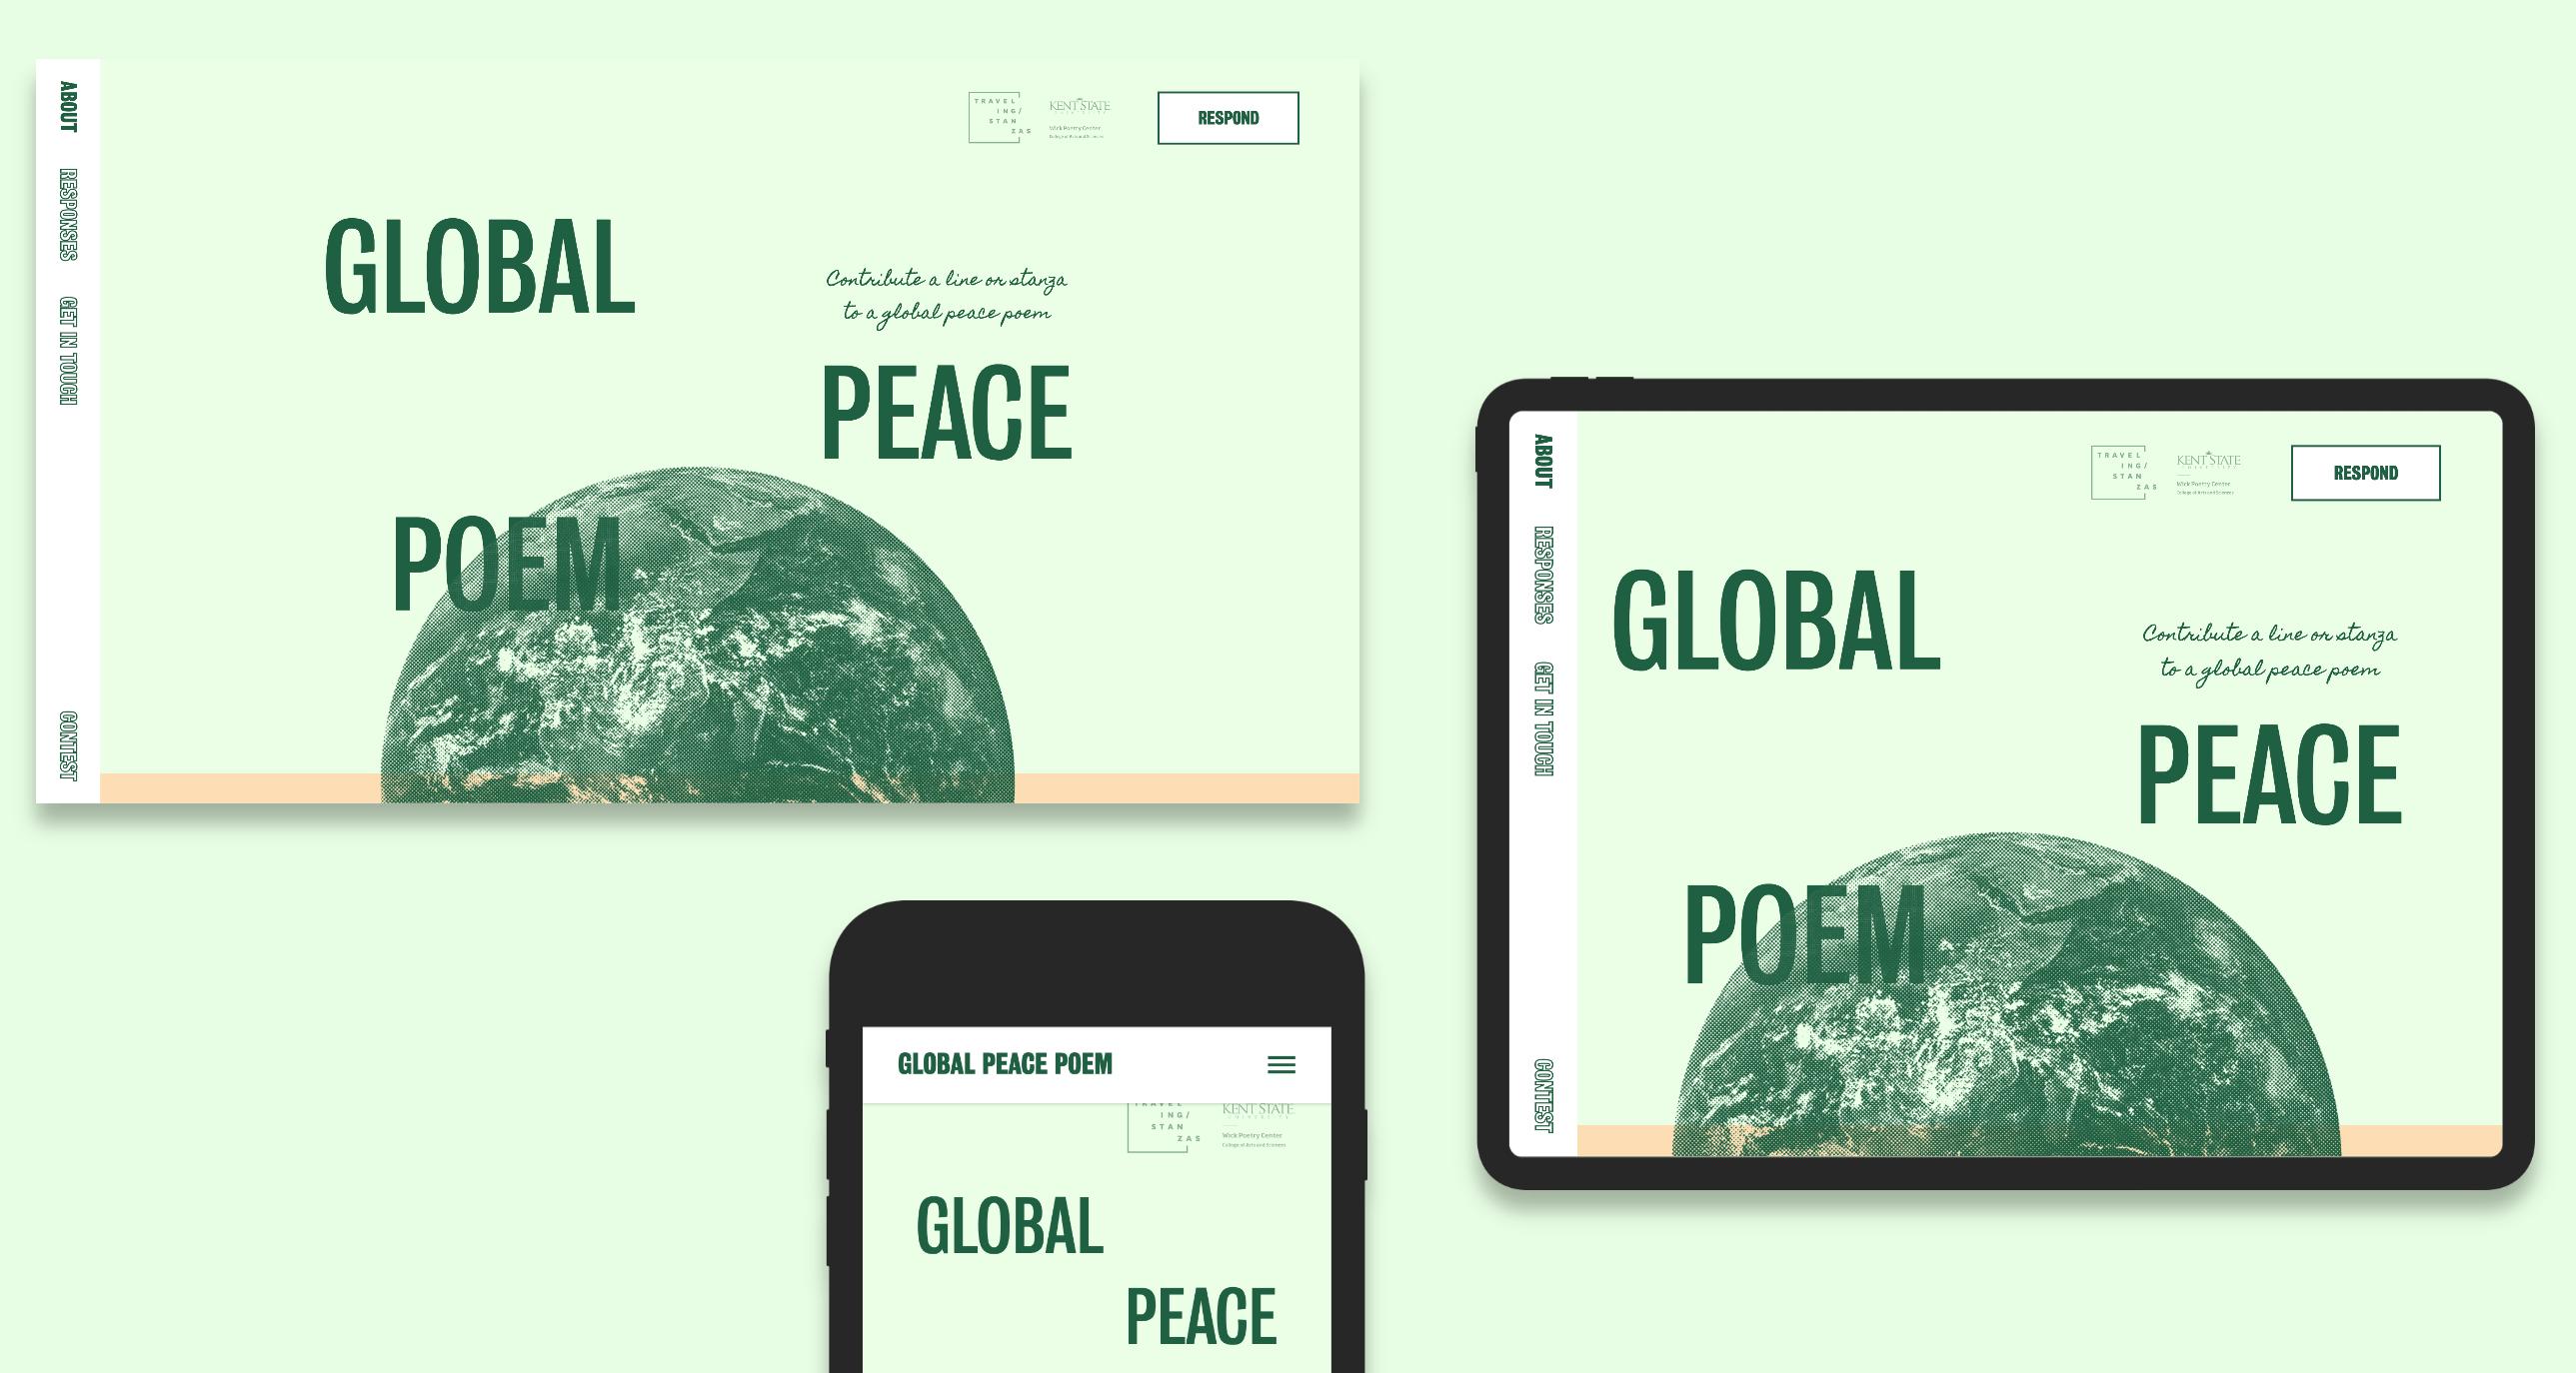 Global Peace Poem